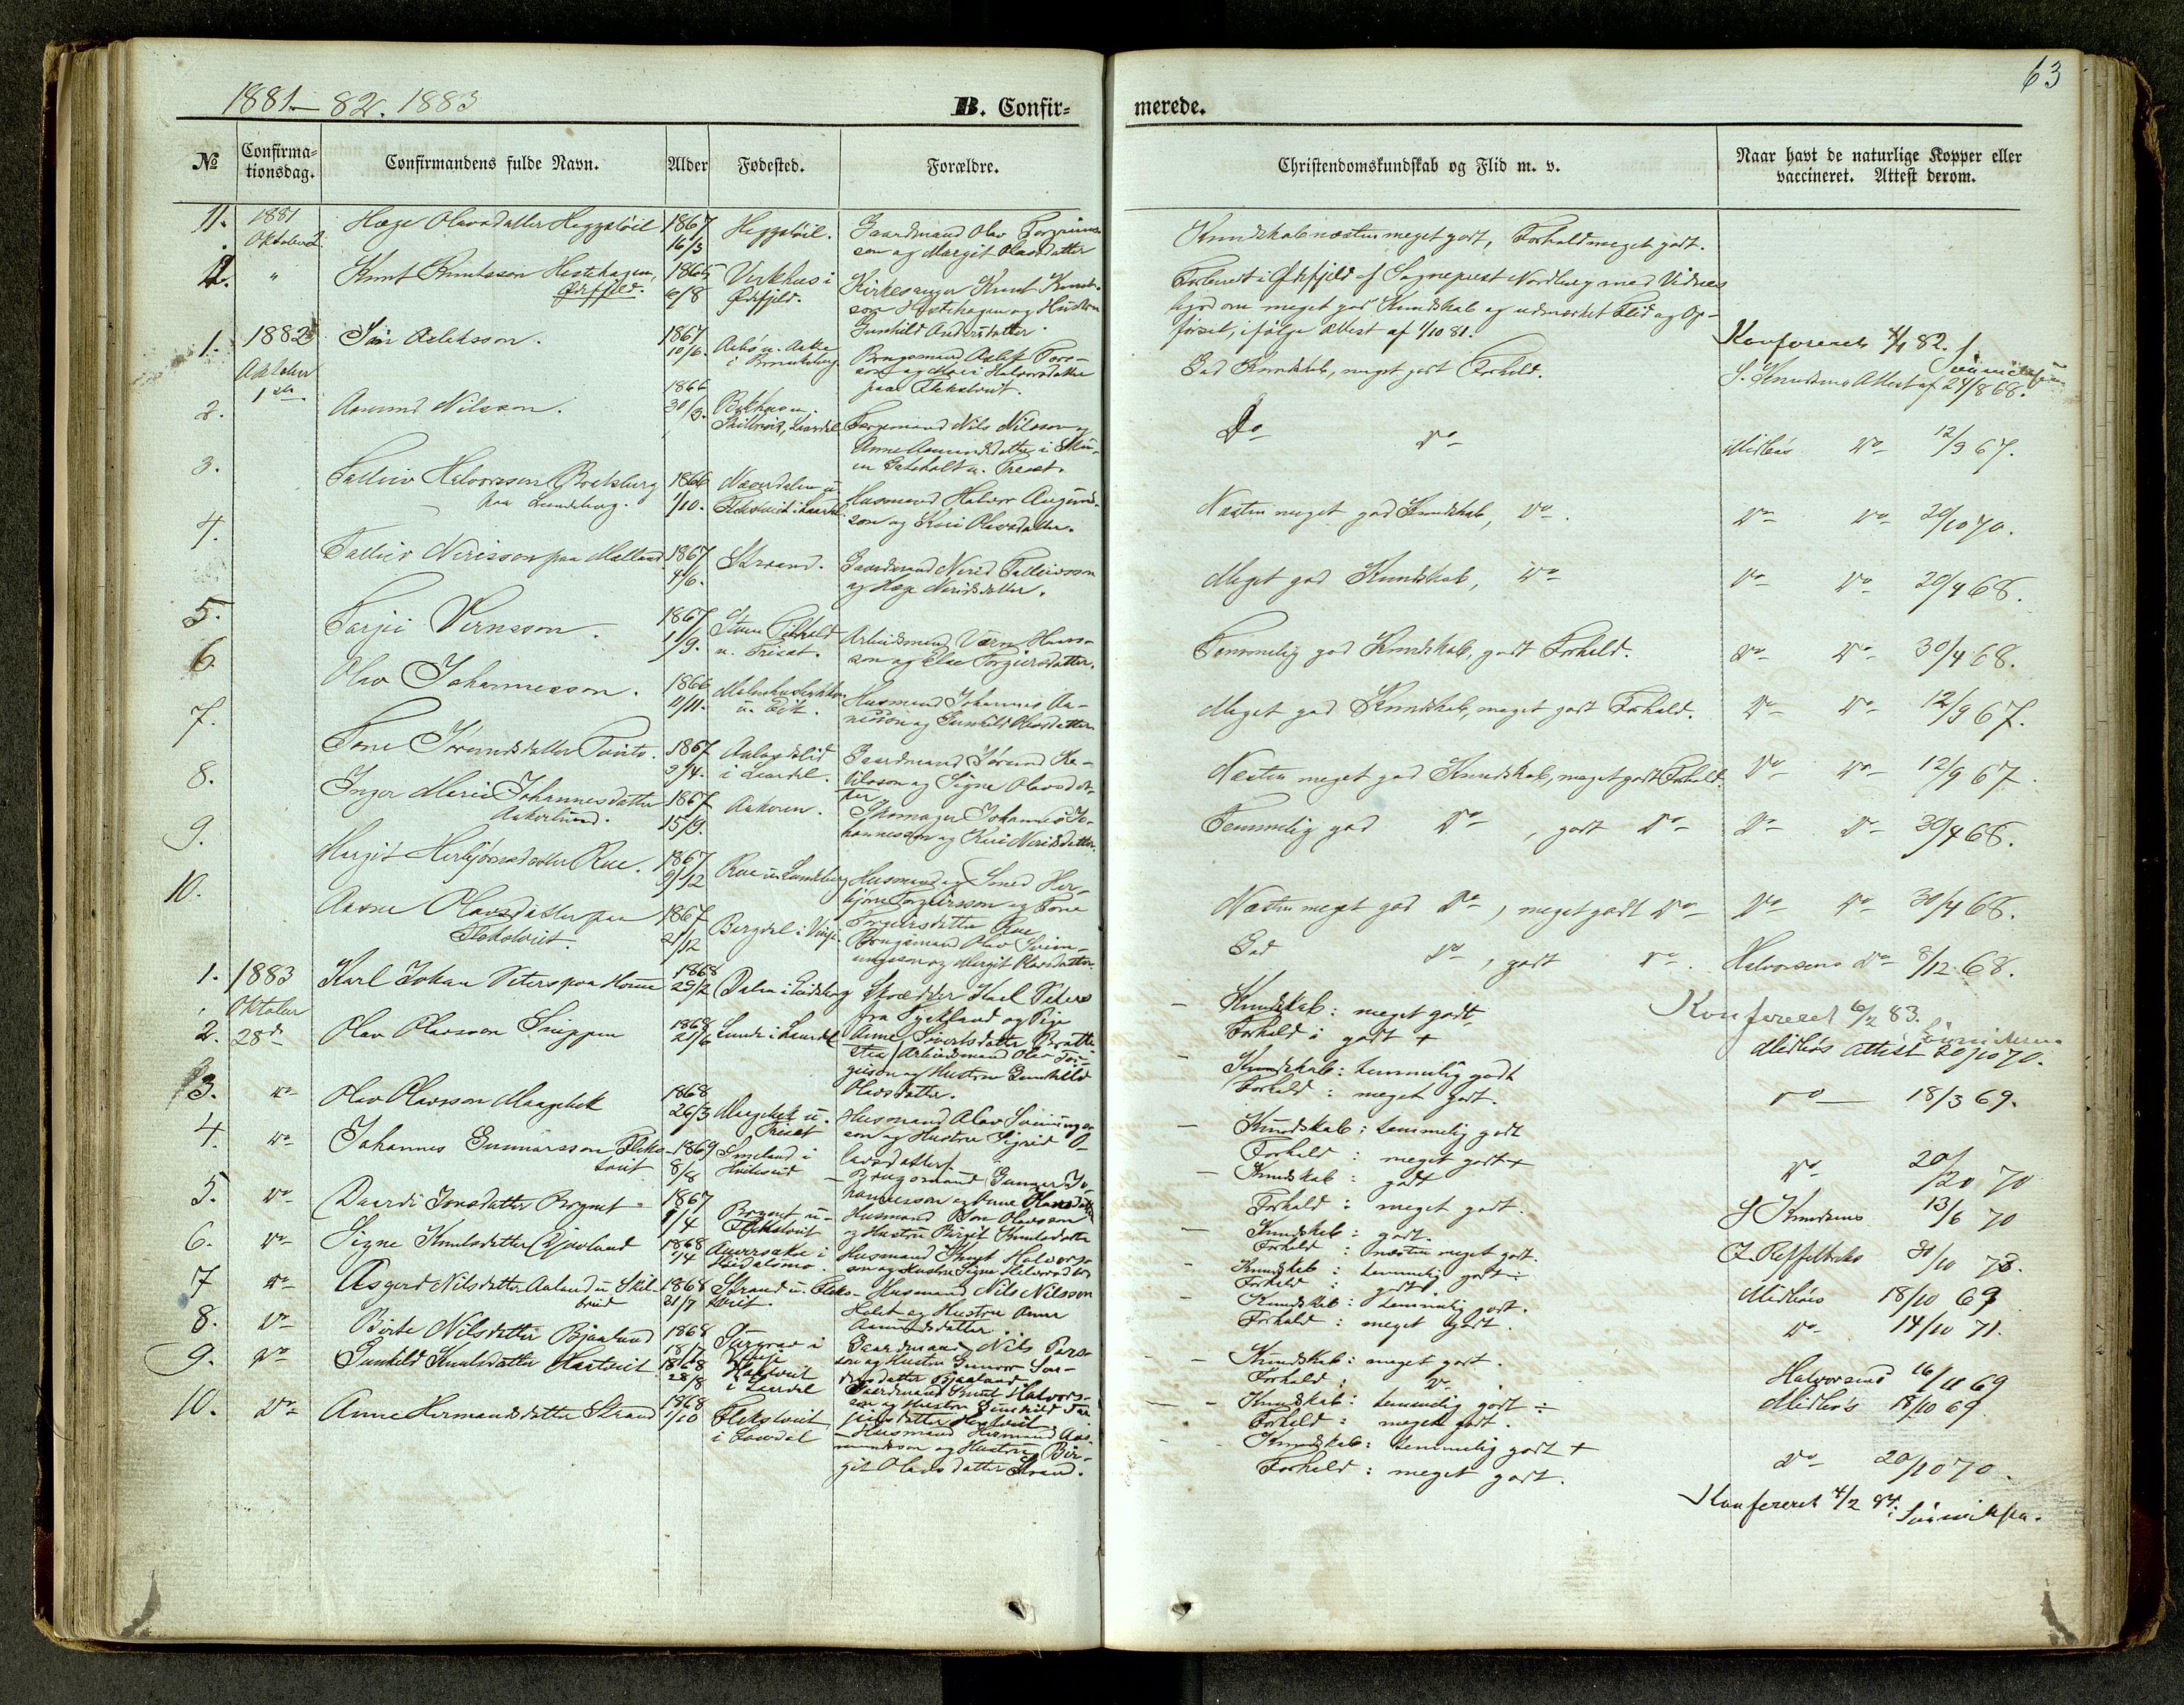 SAKO, Lårdal kirkebøker, G/Ga/L0002: Klokkerbok nr. I 2, 1861-1890, s. 63